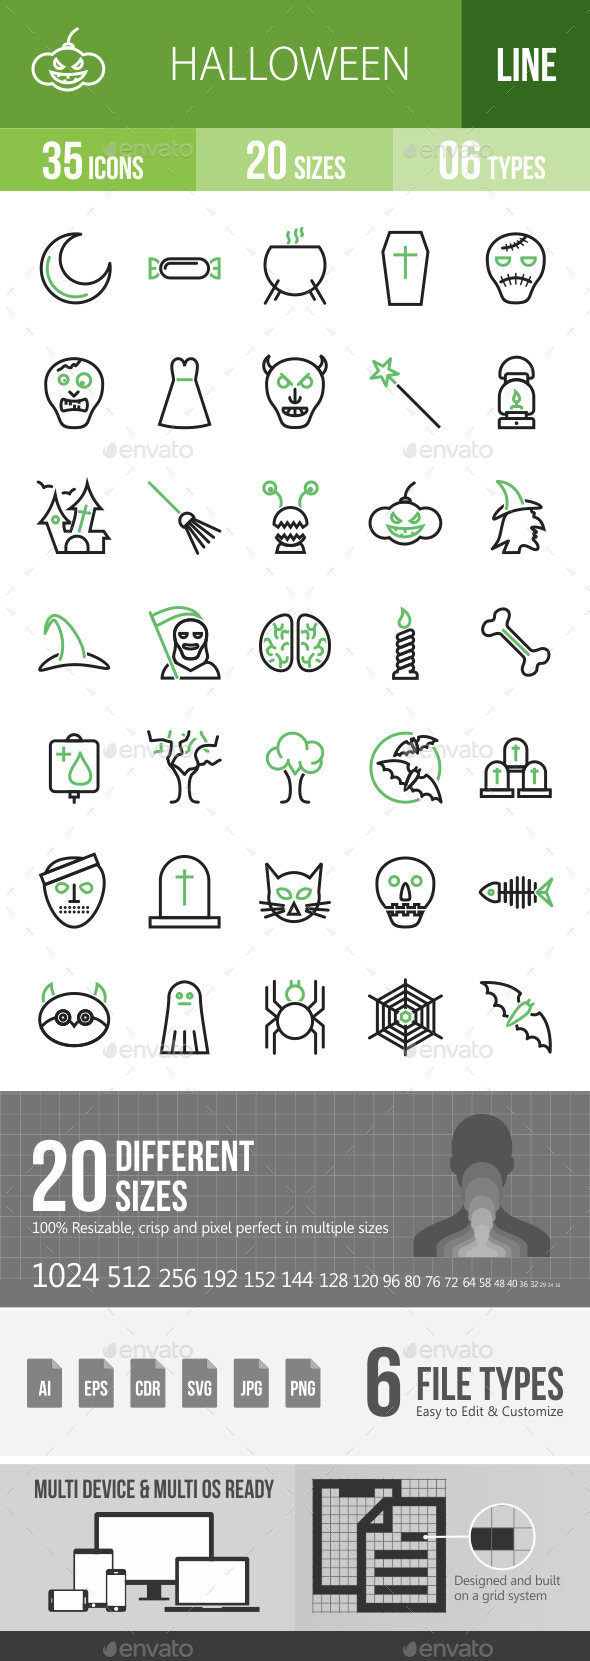 35 Halloween Green & Black Line Icons - Icons